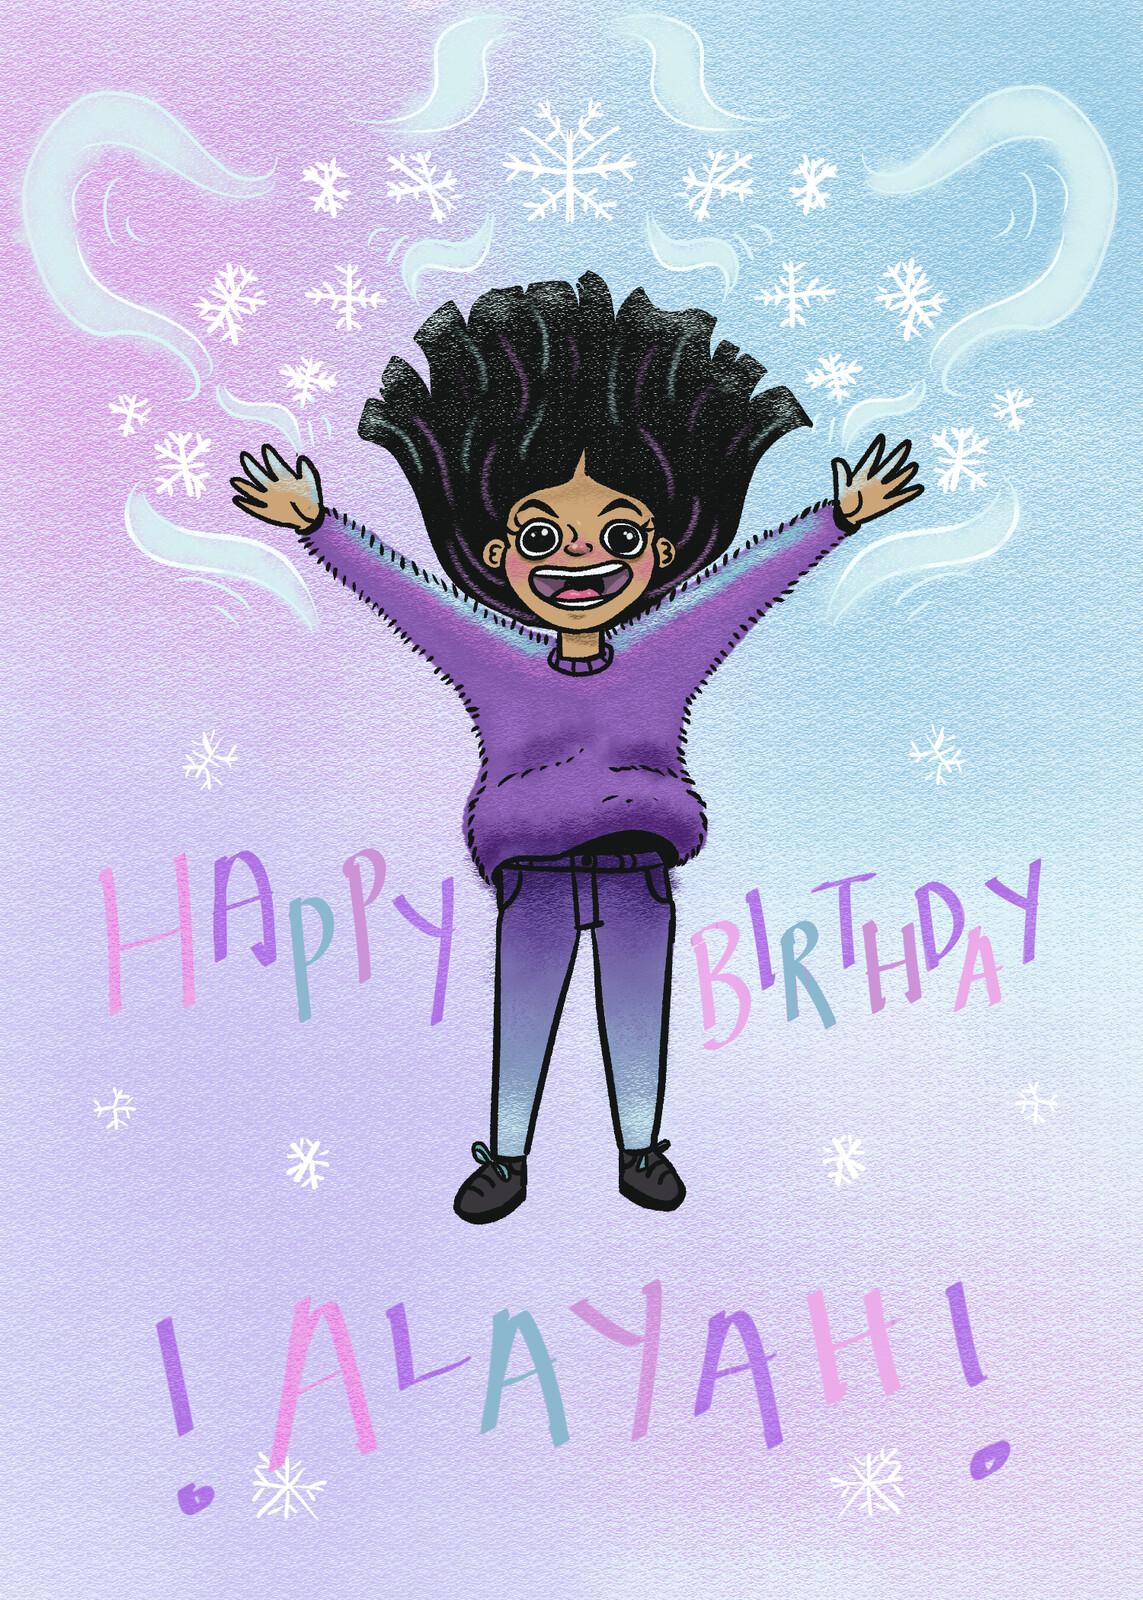 A birthday card I drew for my boyfriends niece.